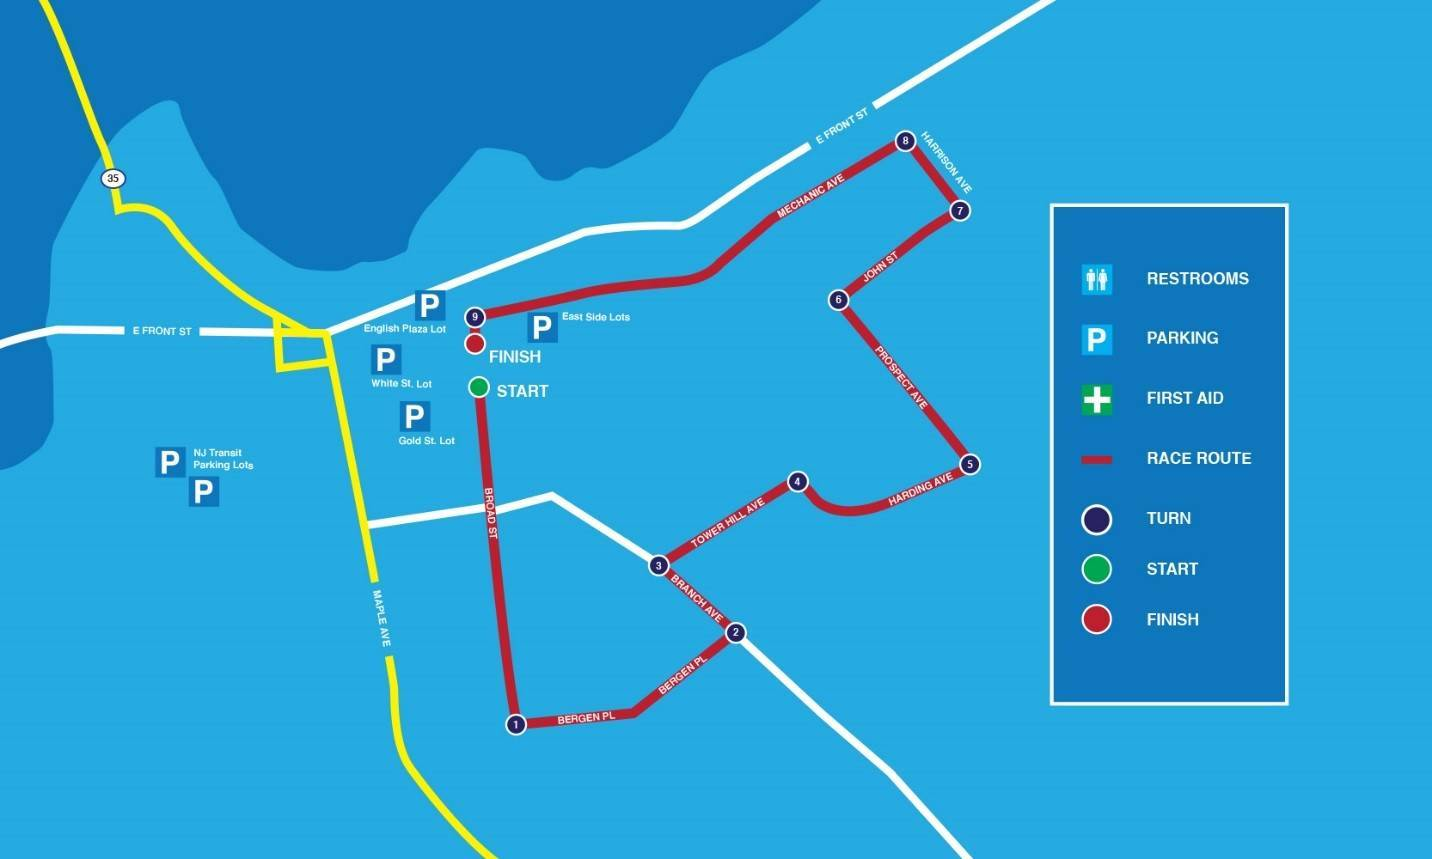 8a9c4bfc370c1c9367c4_Red_Bank_Classic_5k_Map.jpg